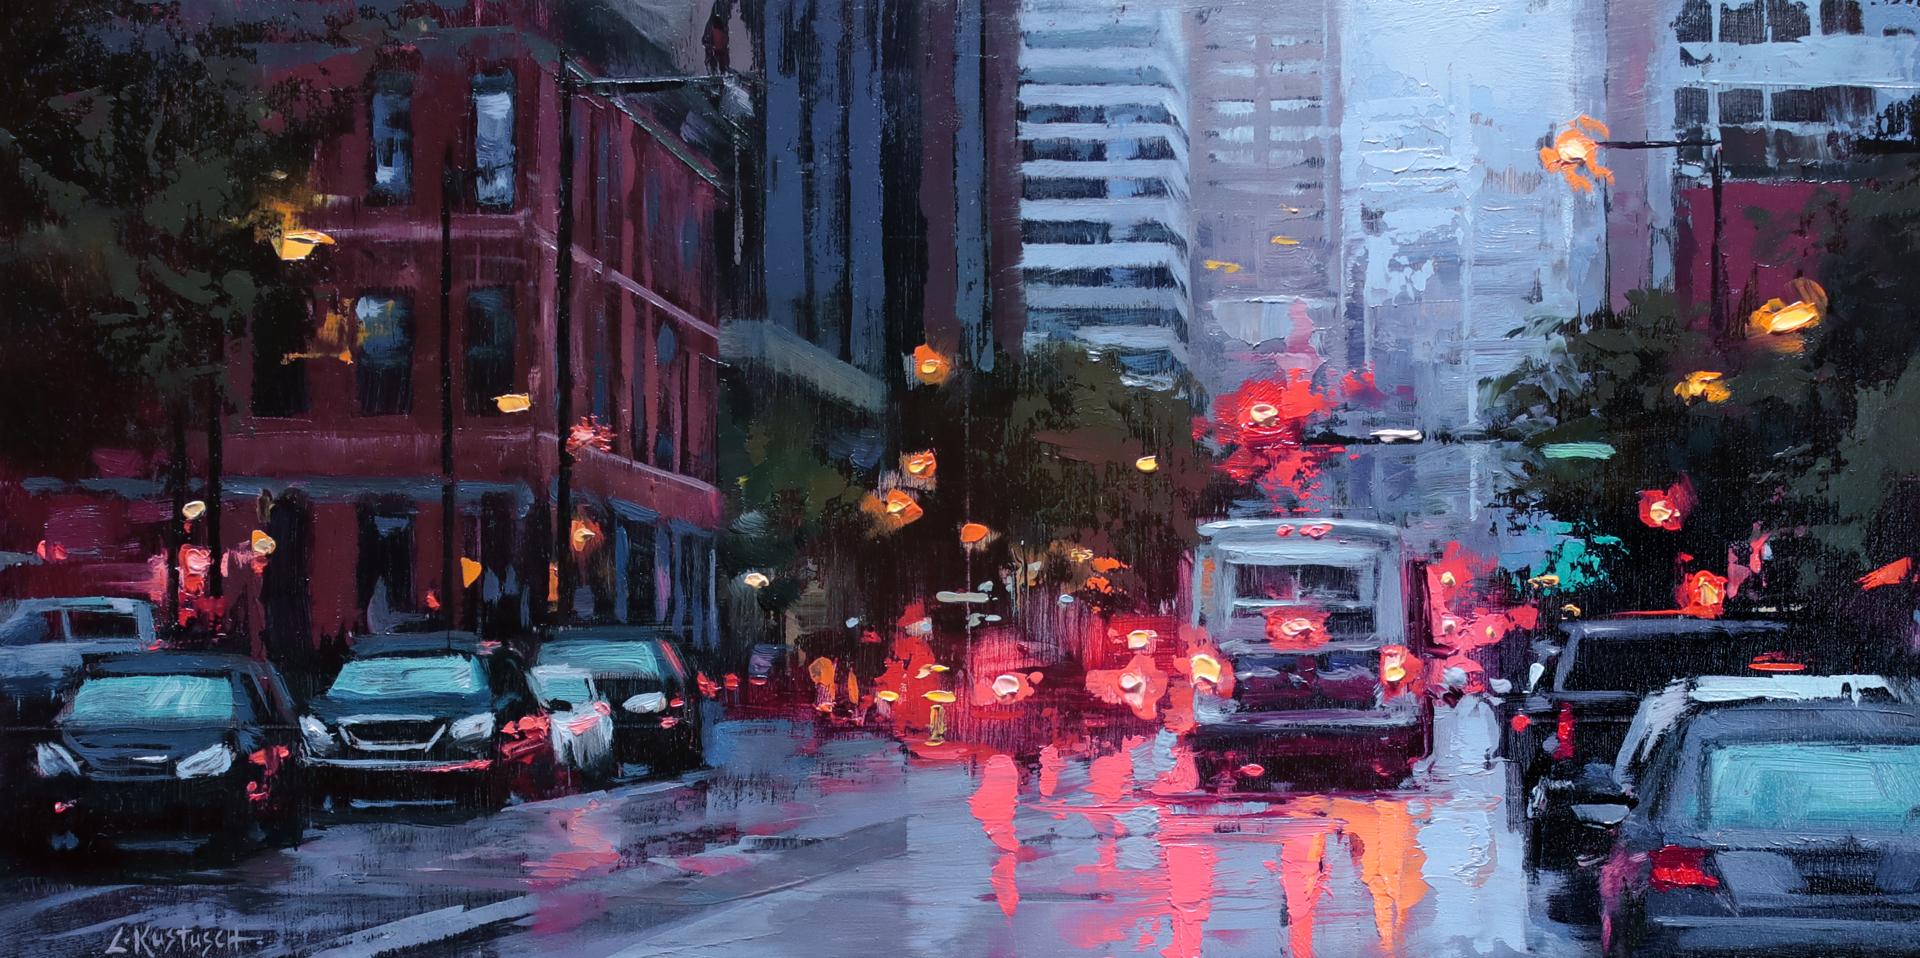 17th & Blake St. by Lindsey Kustusch